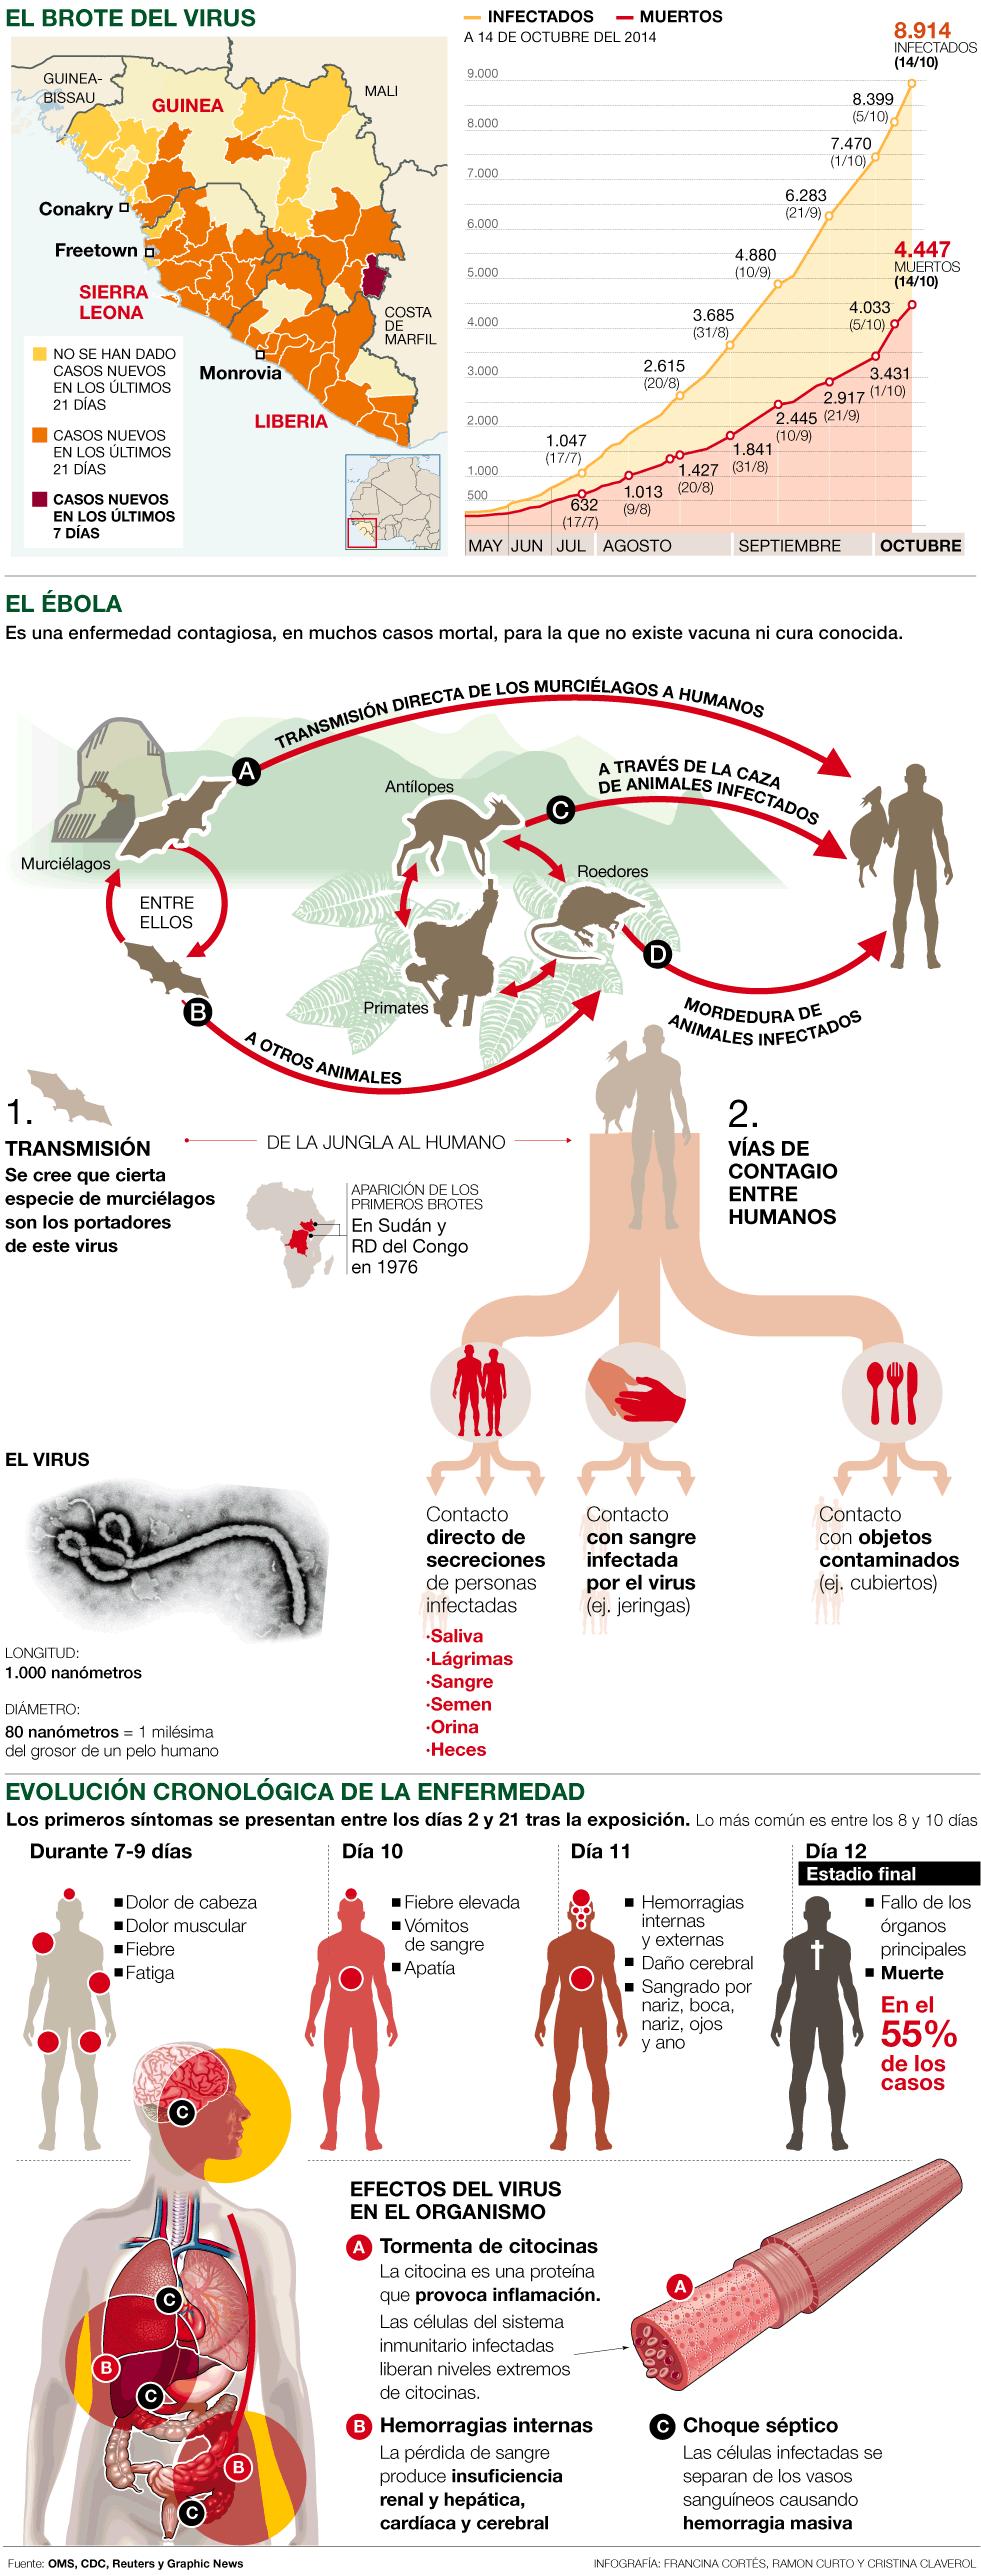 ebola brote zonas transmision